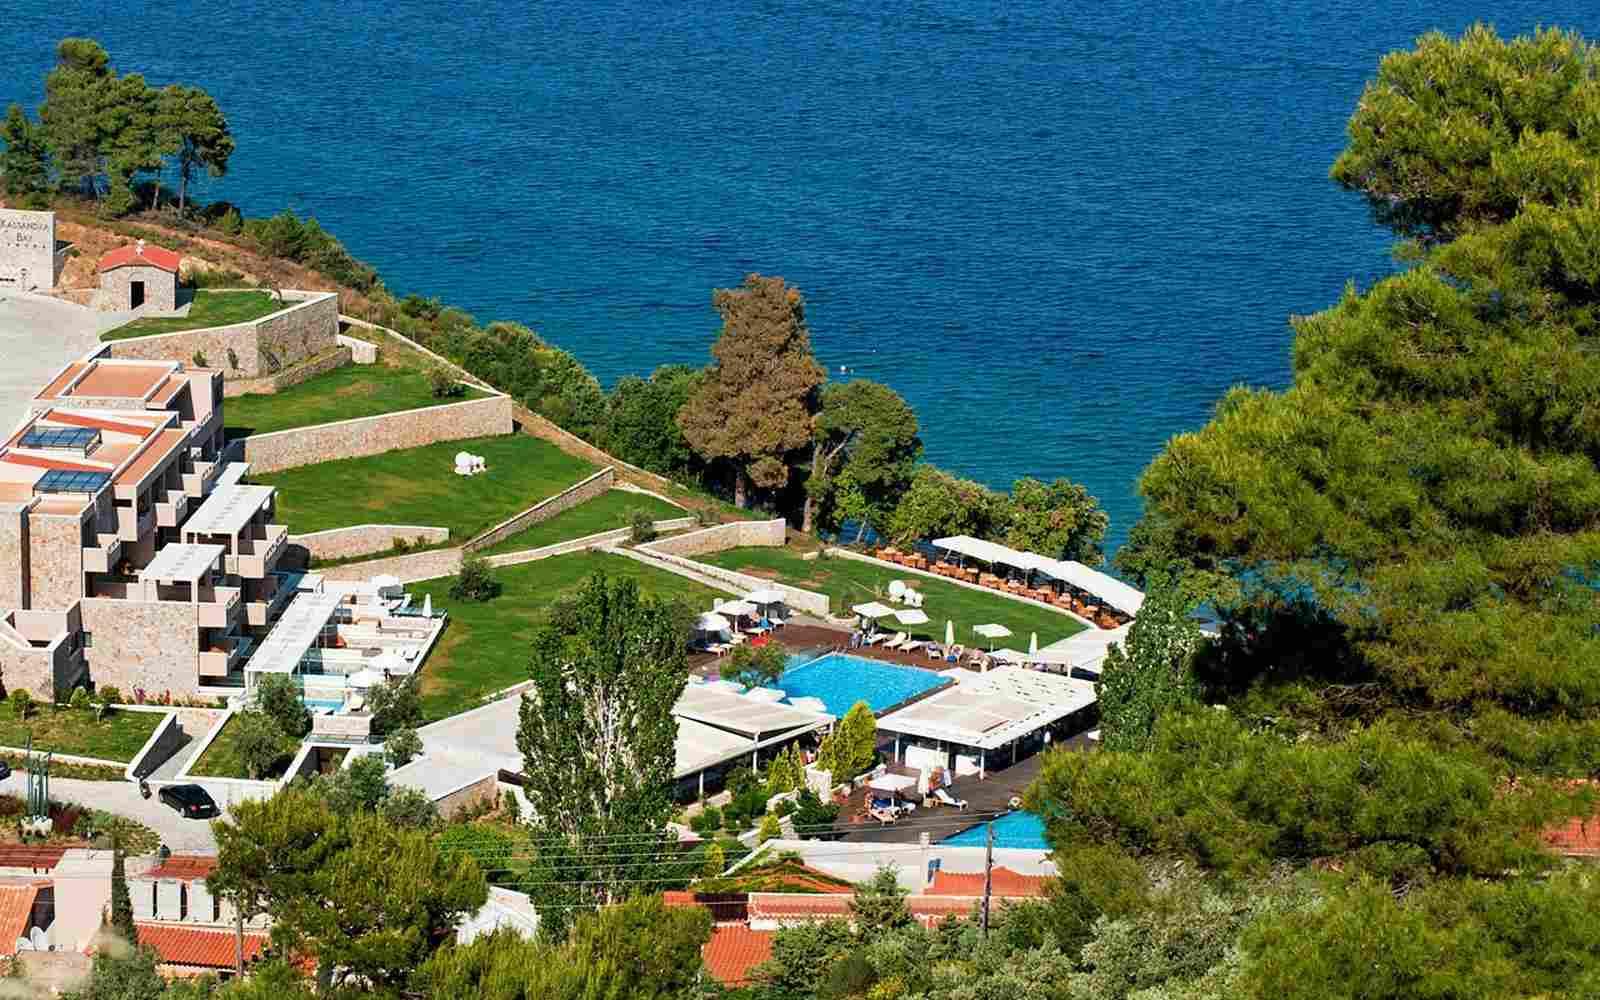 https://www.casacaribepuertomorelos.com/wp-content/uploads/2016/03/summer-hotel-03.jpg